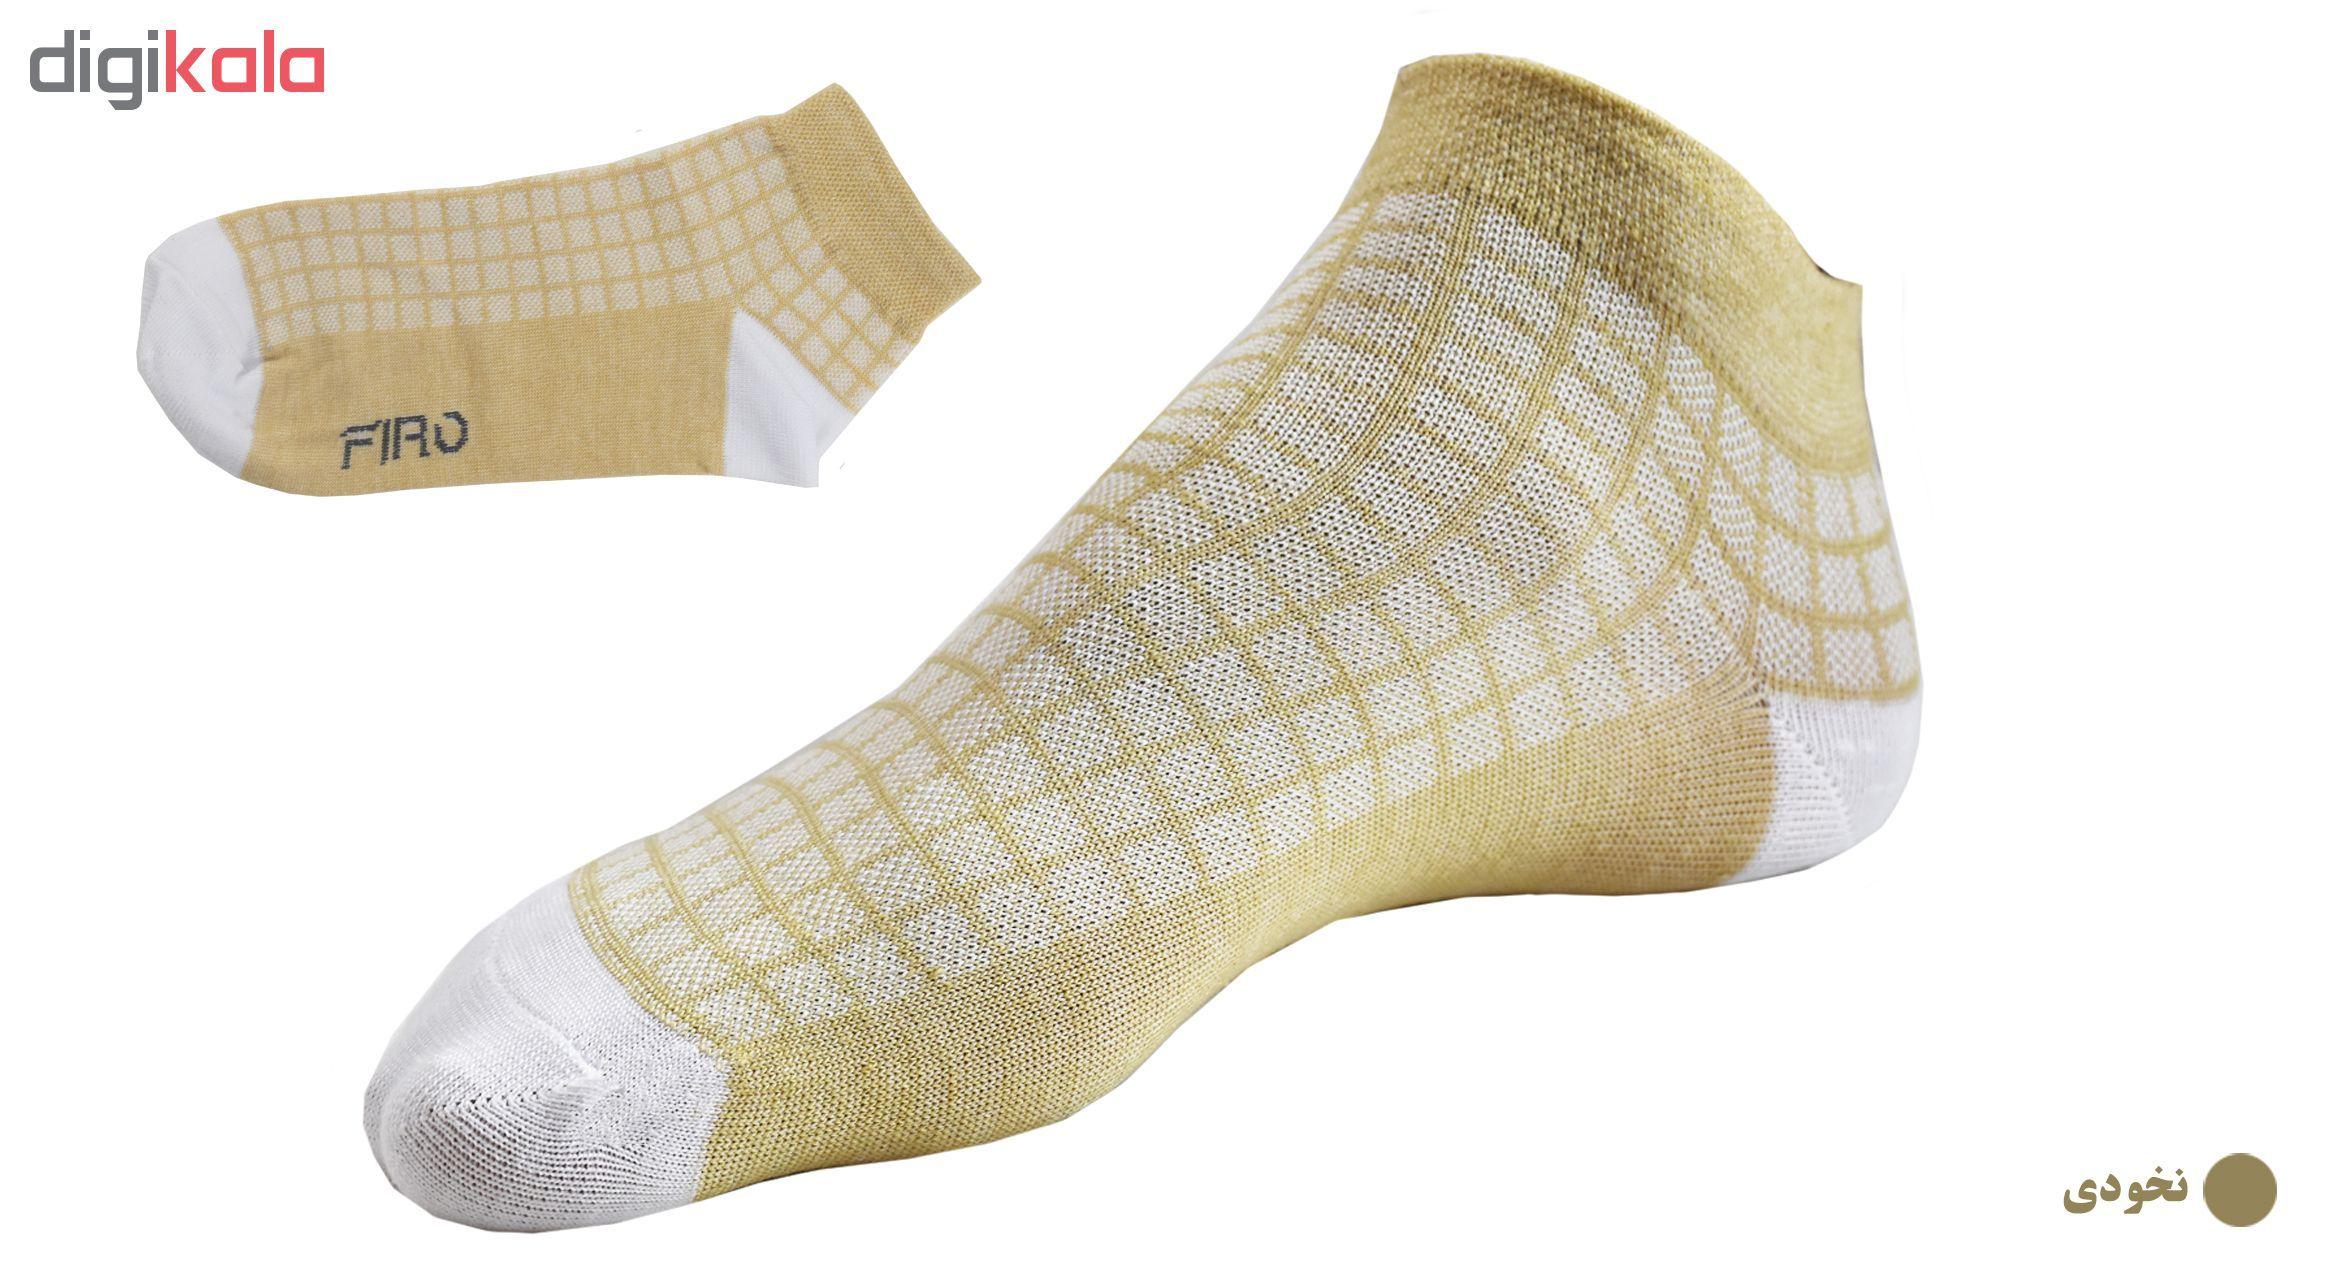 جوراب مردانه فیرو کد FT250 مجموعه 6 عددی main 1 2